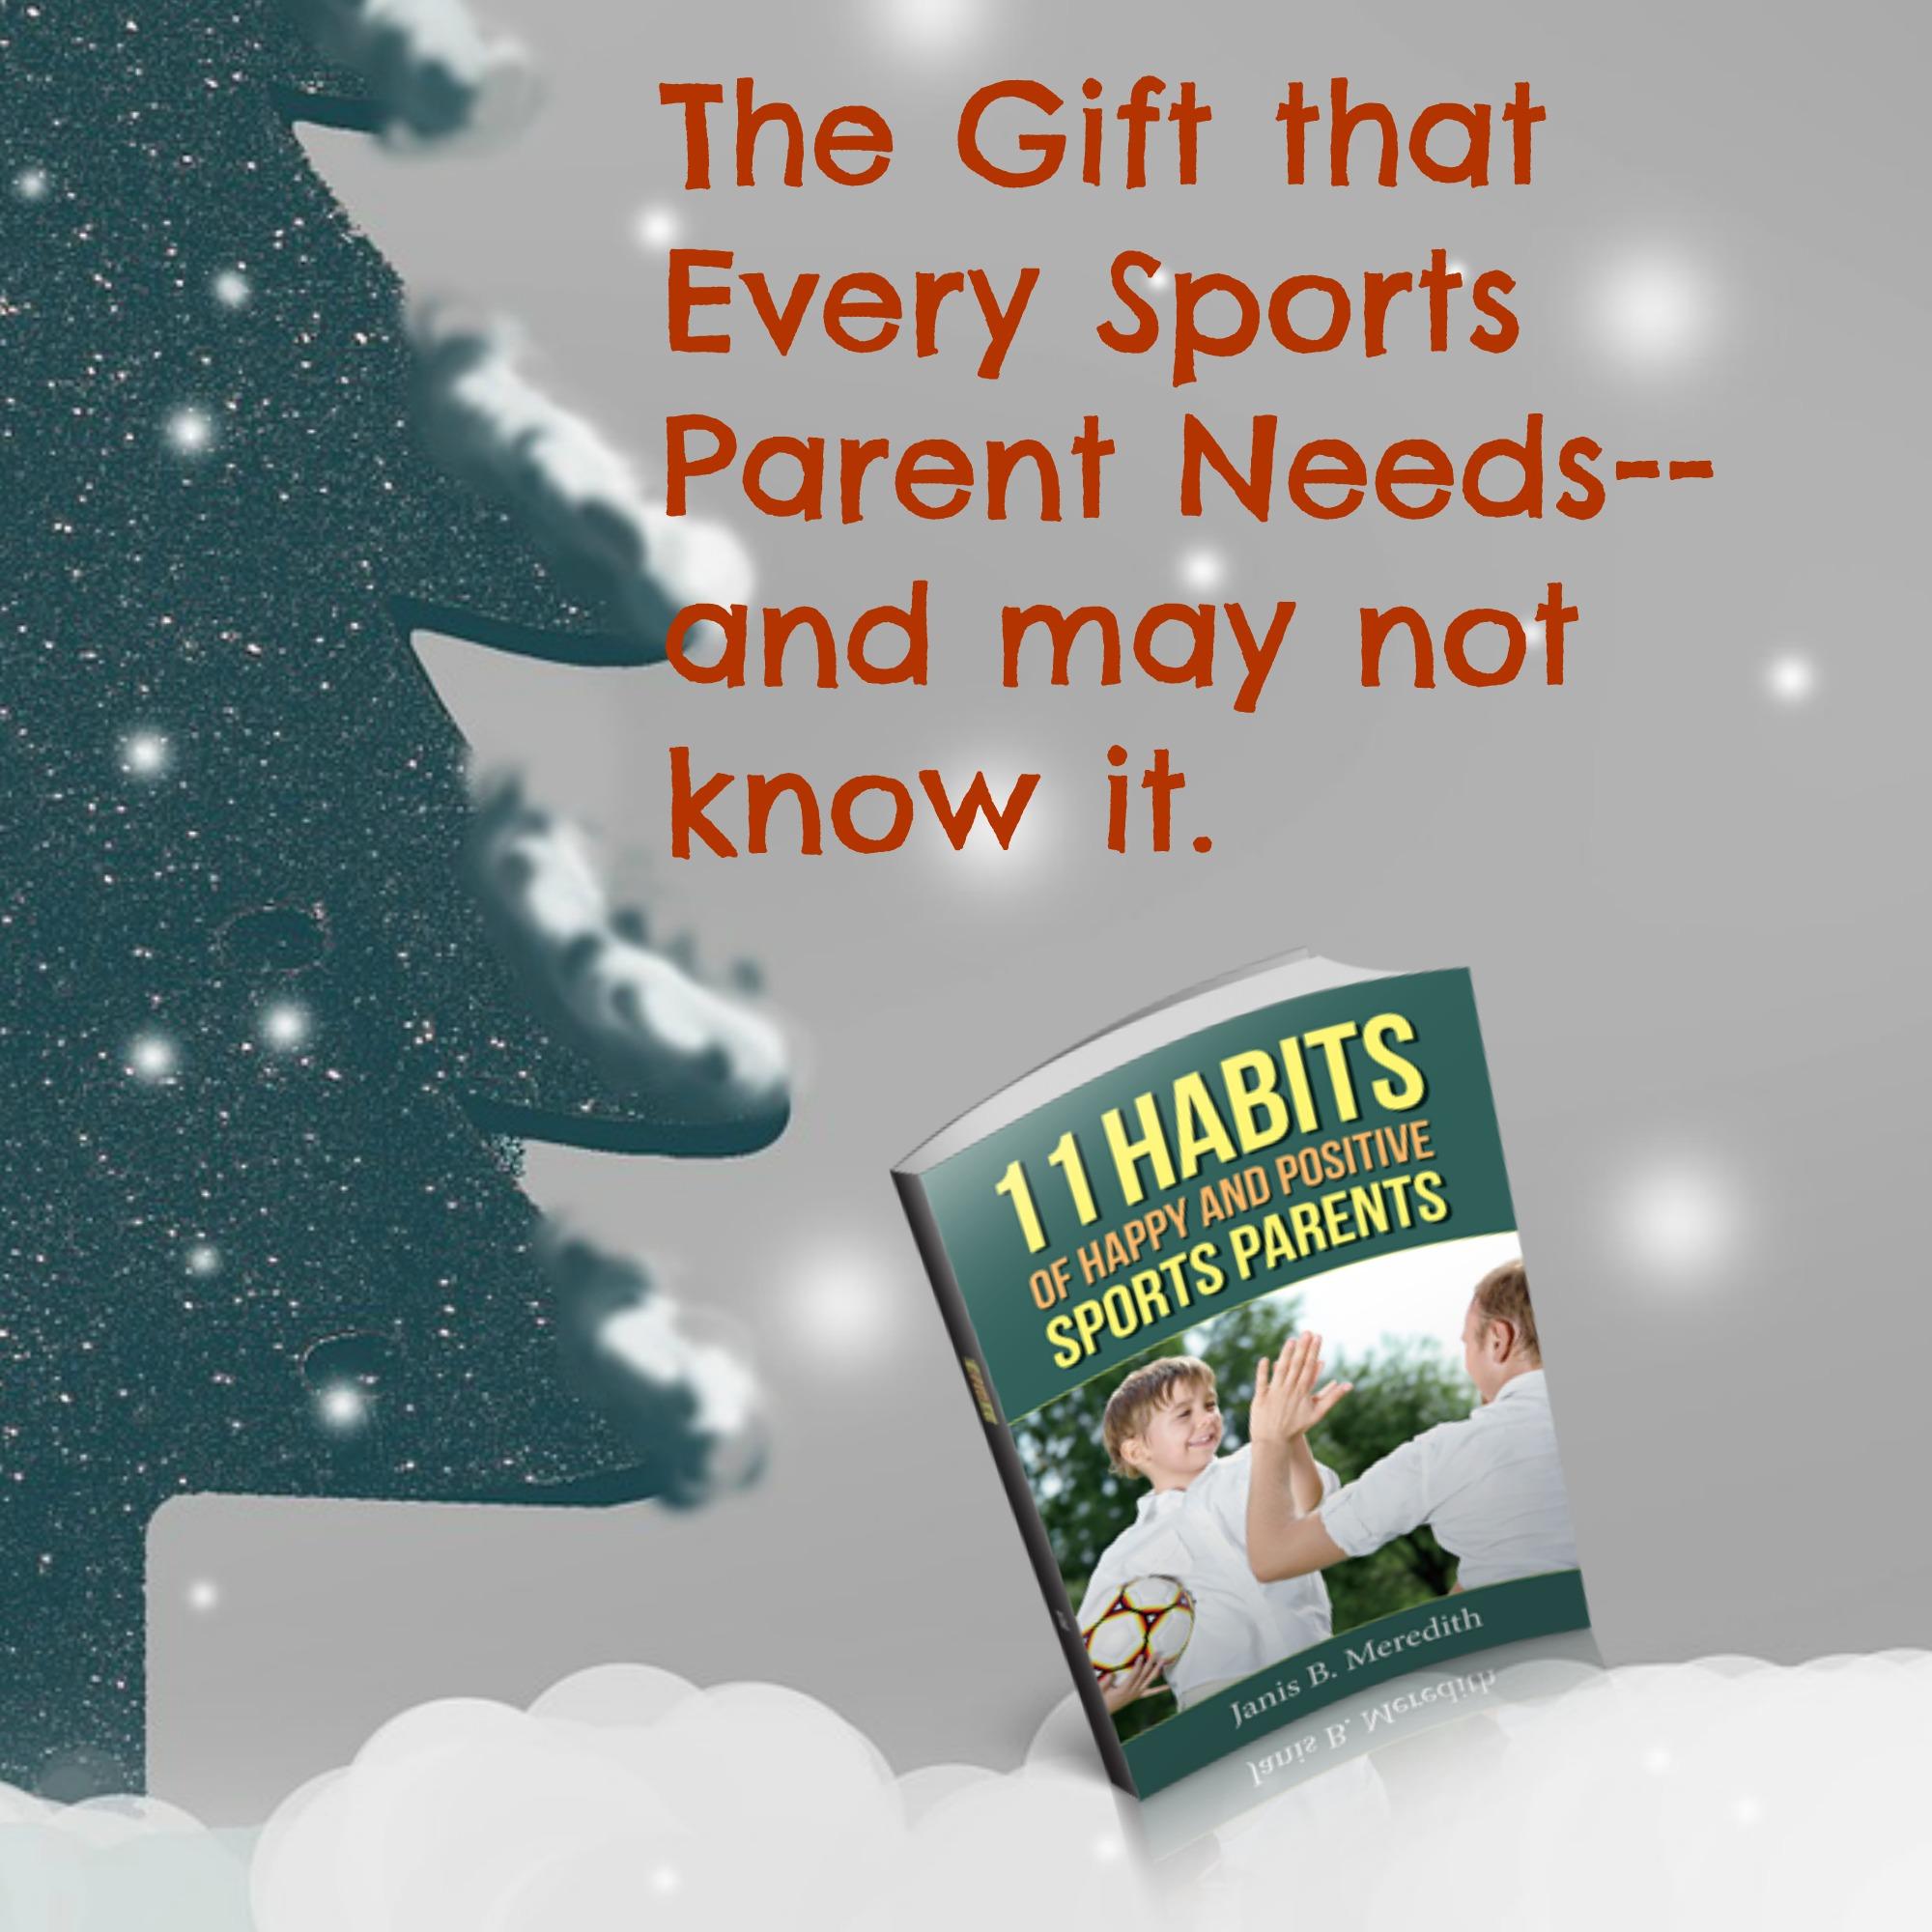 christmas-ad-for-book-1